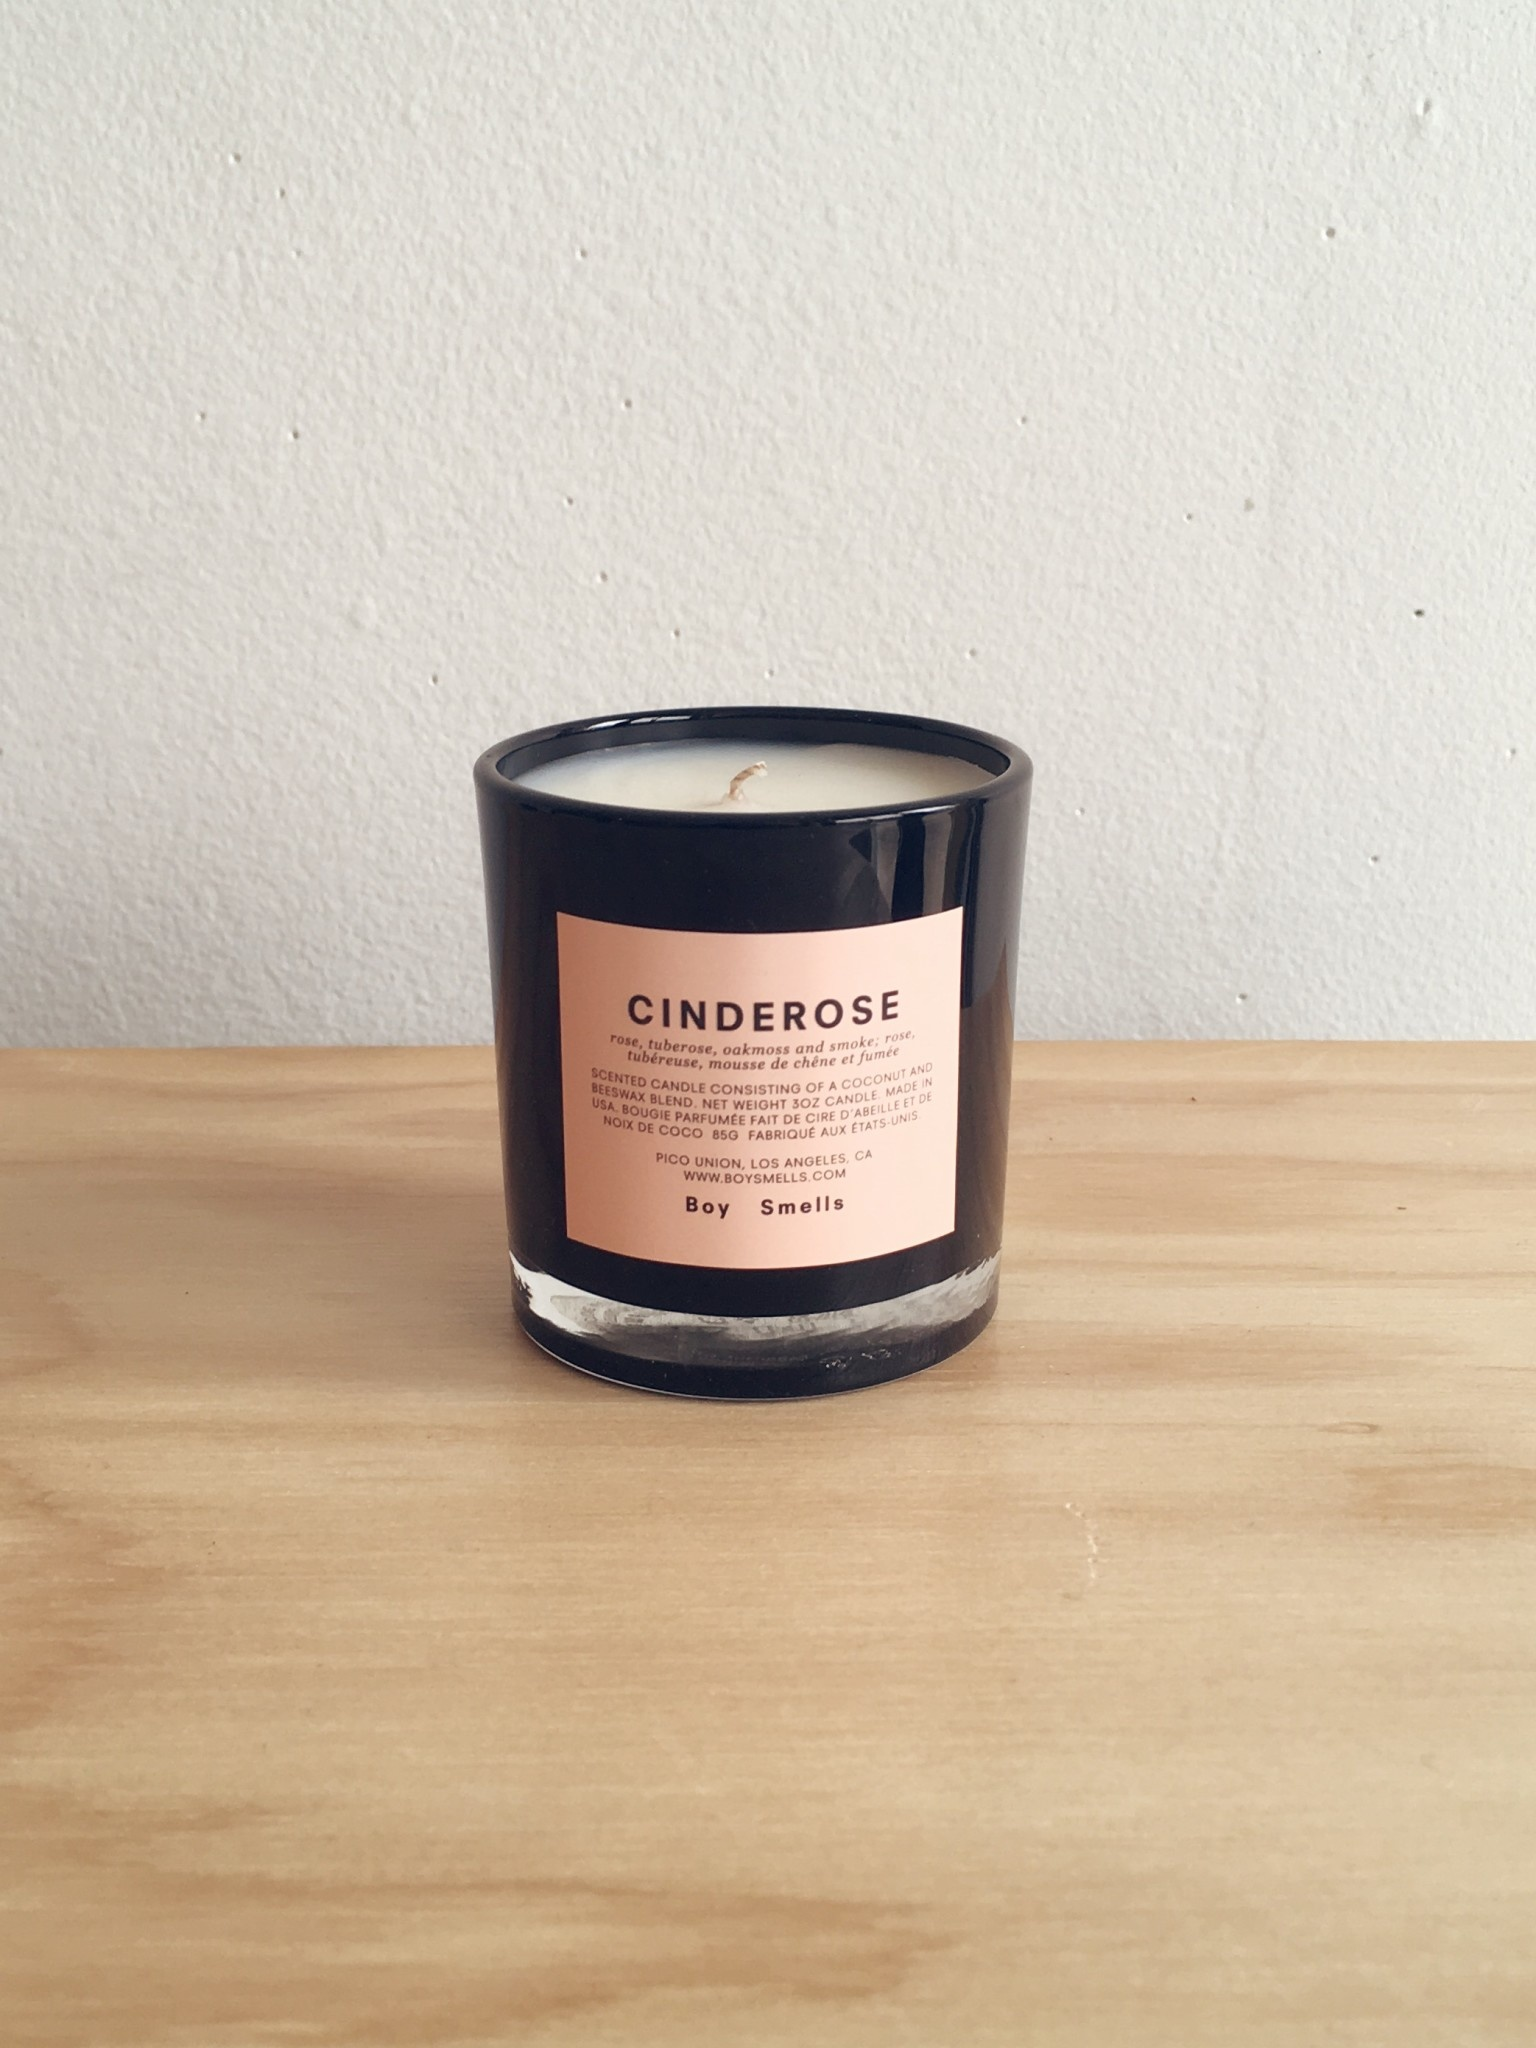 Boy Smells Boy Smells Candle - 3 oz